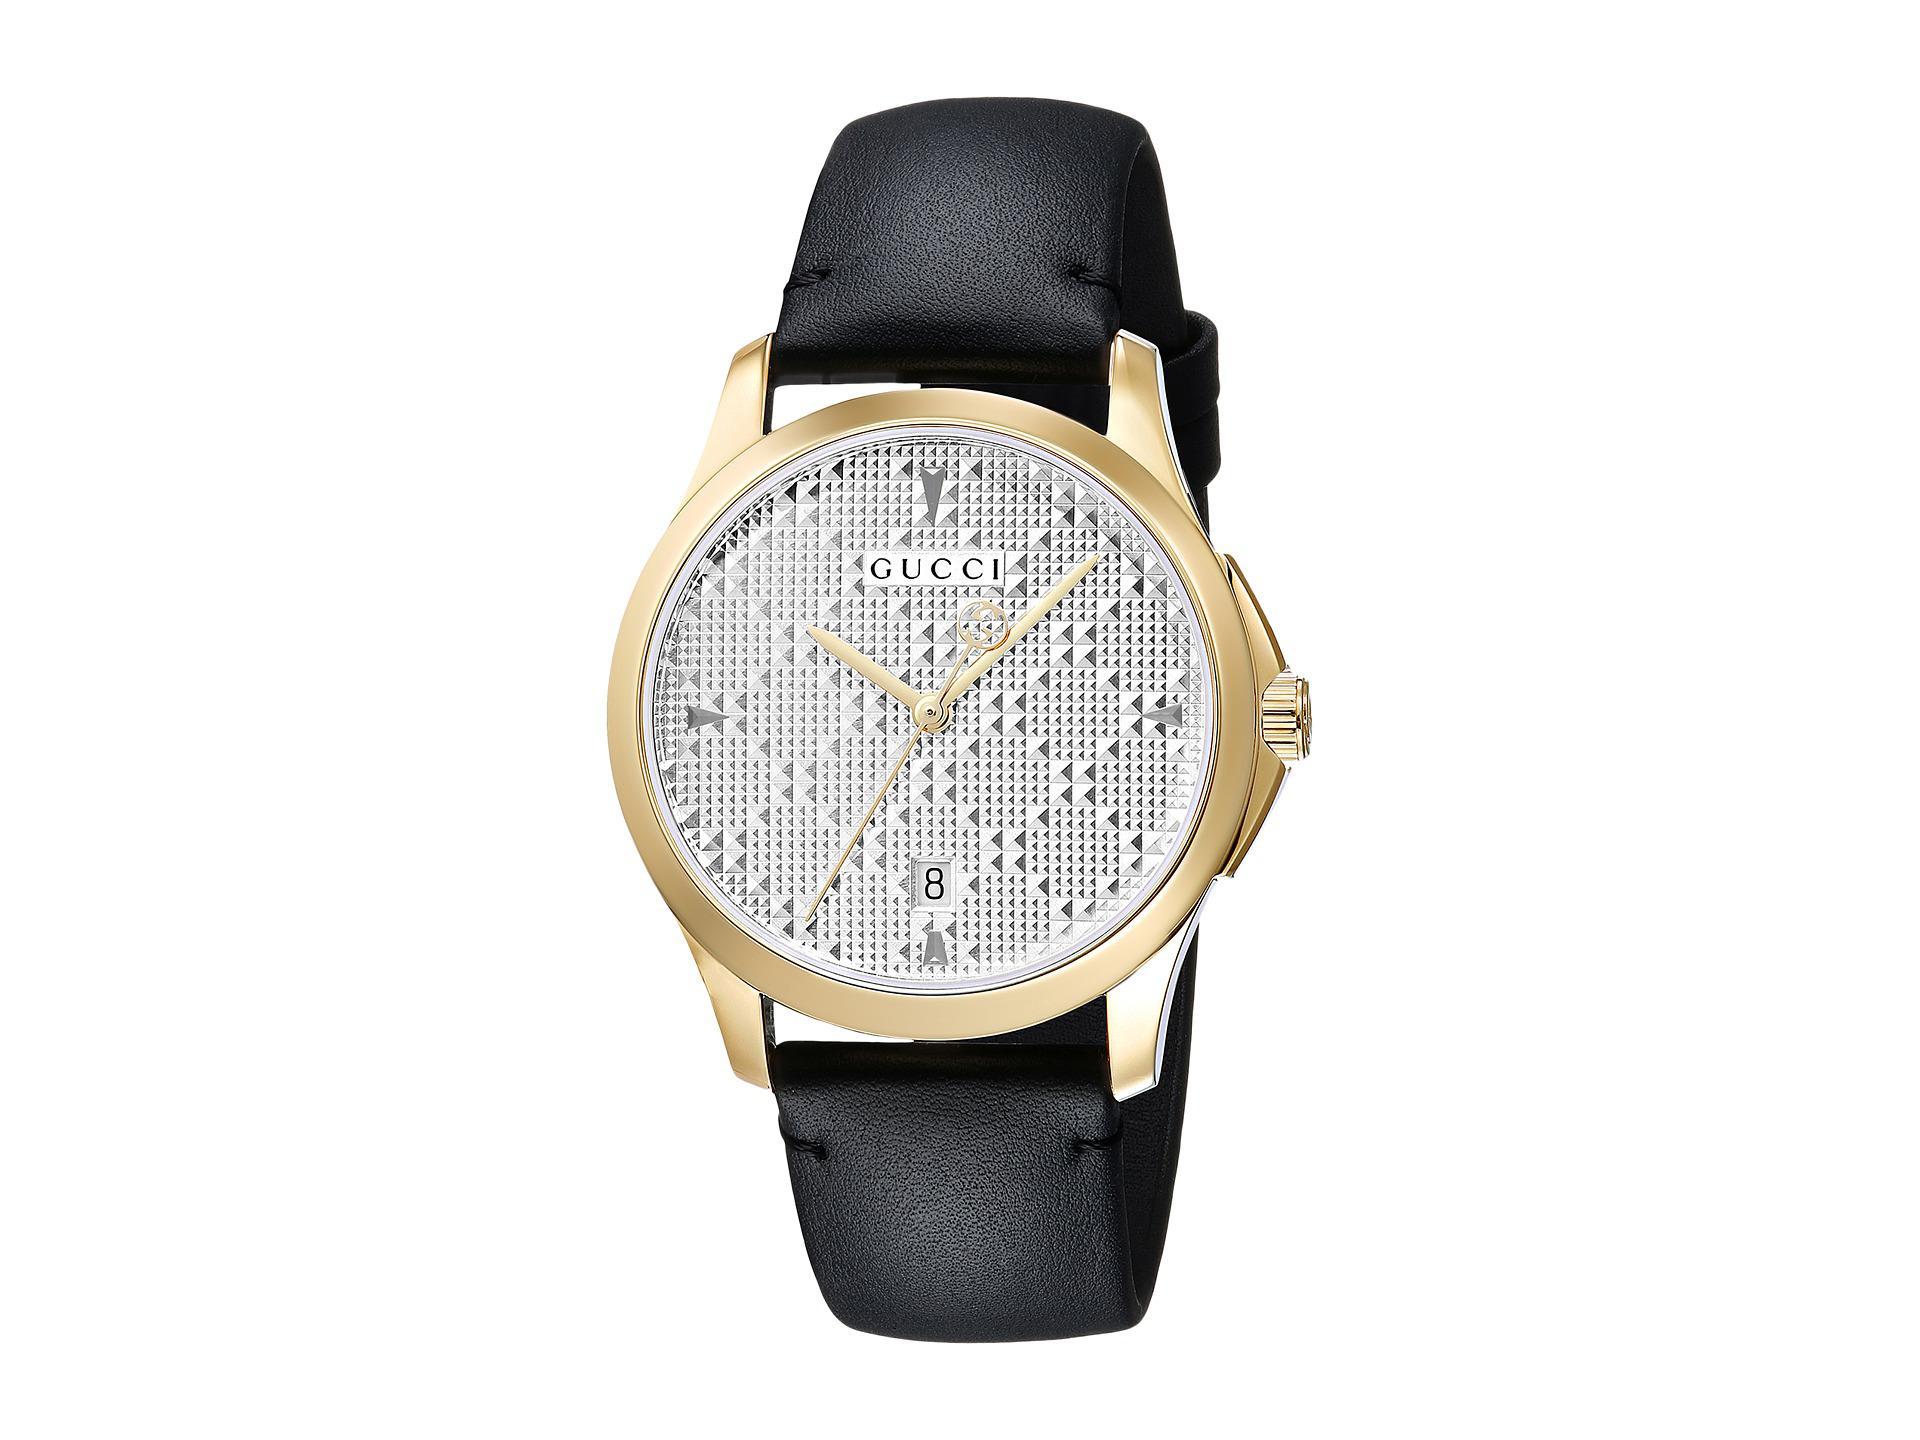 5945ca65f73 Lyst - Gucci G-timeless - Ya1264027 in Black for Men